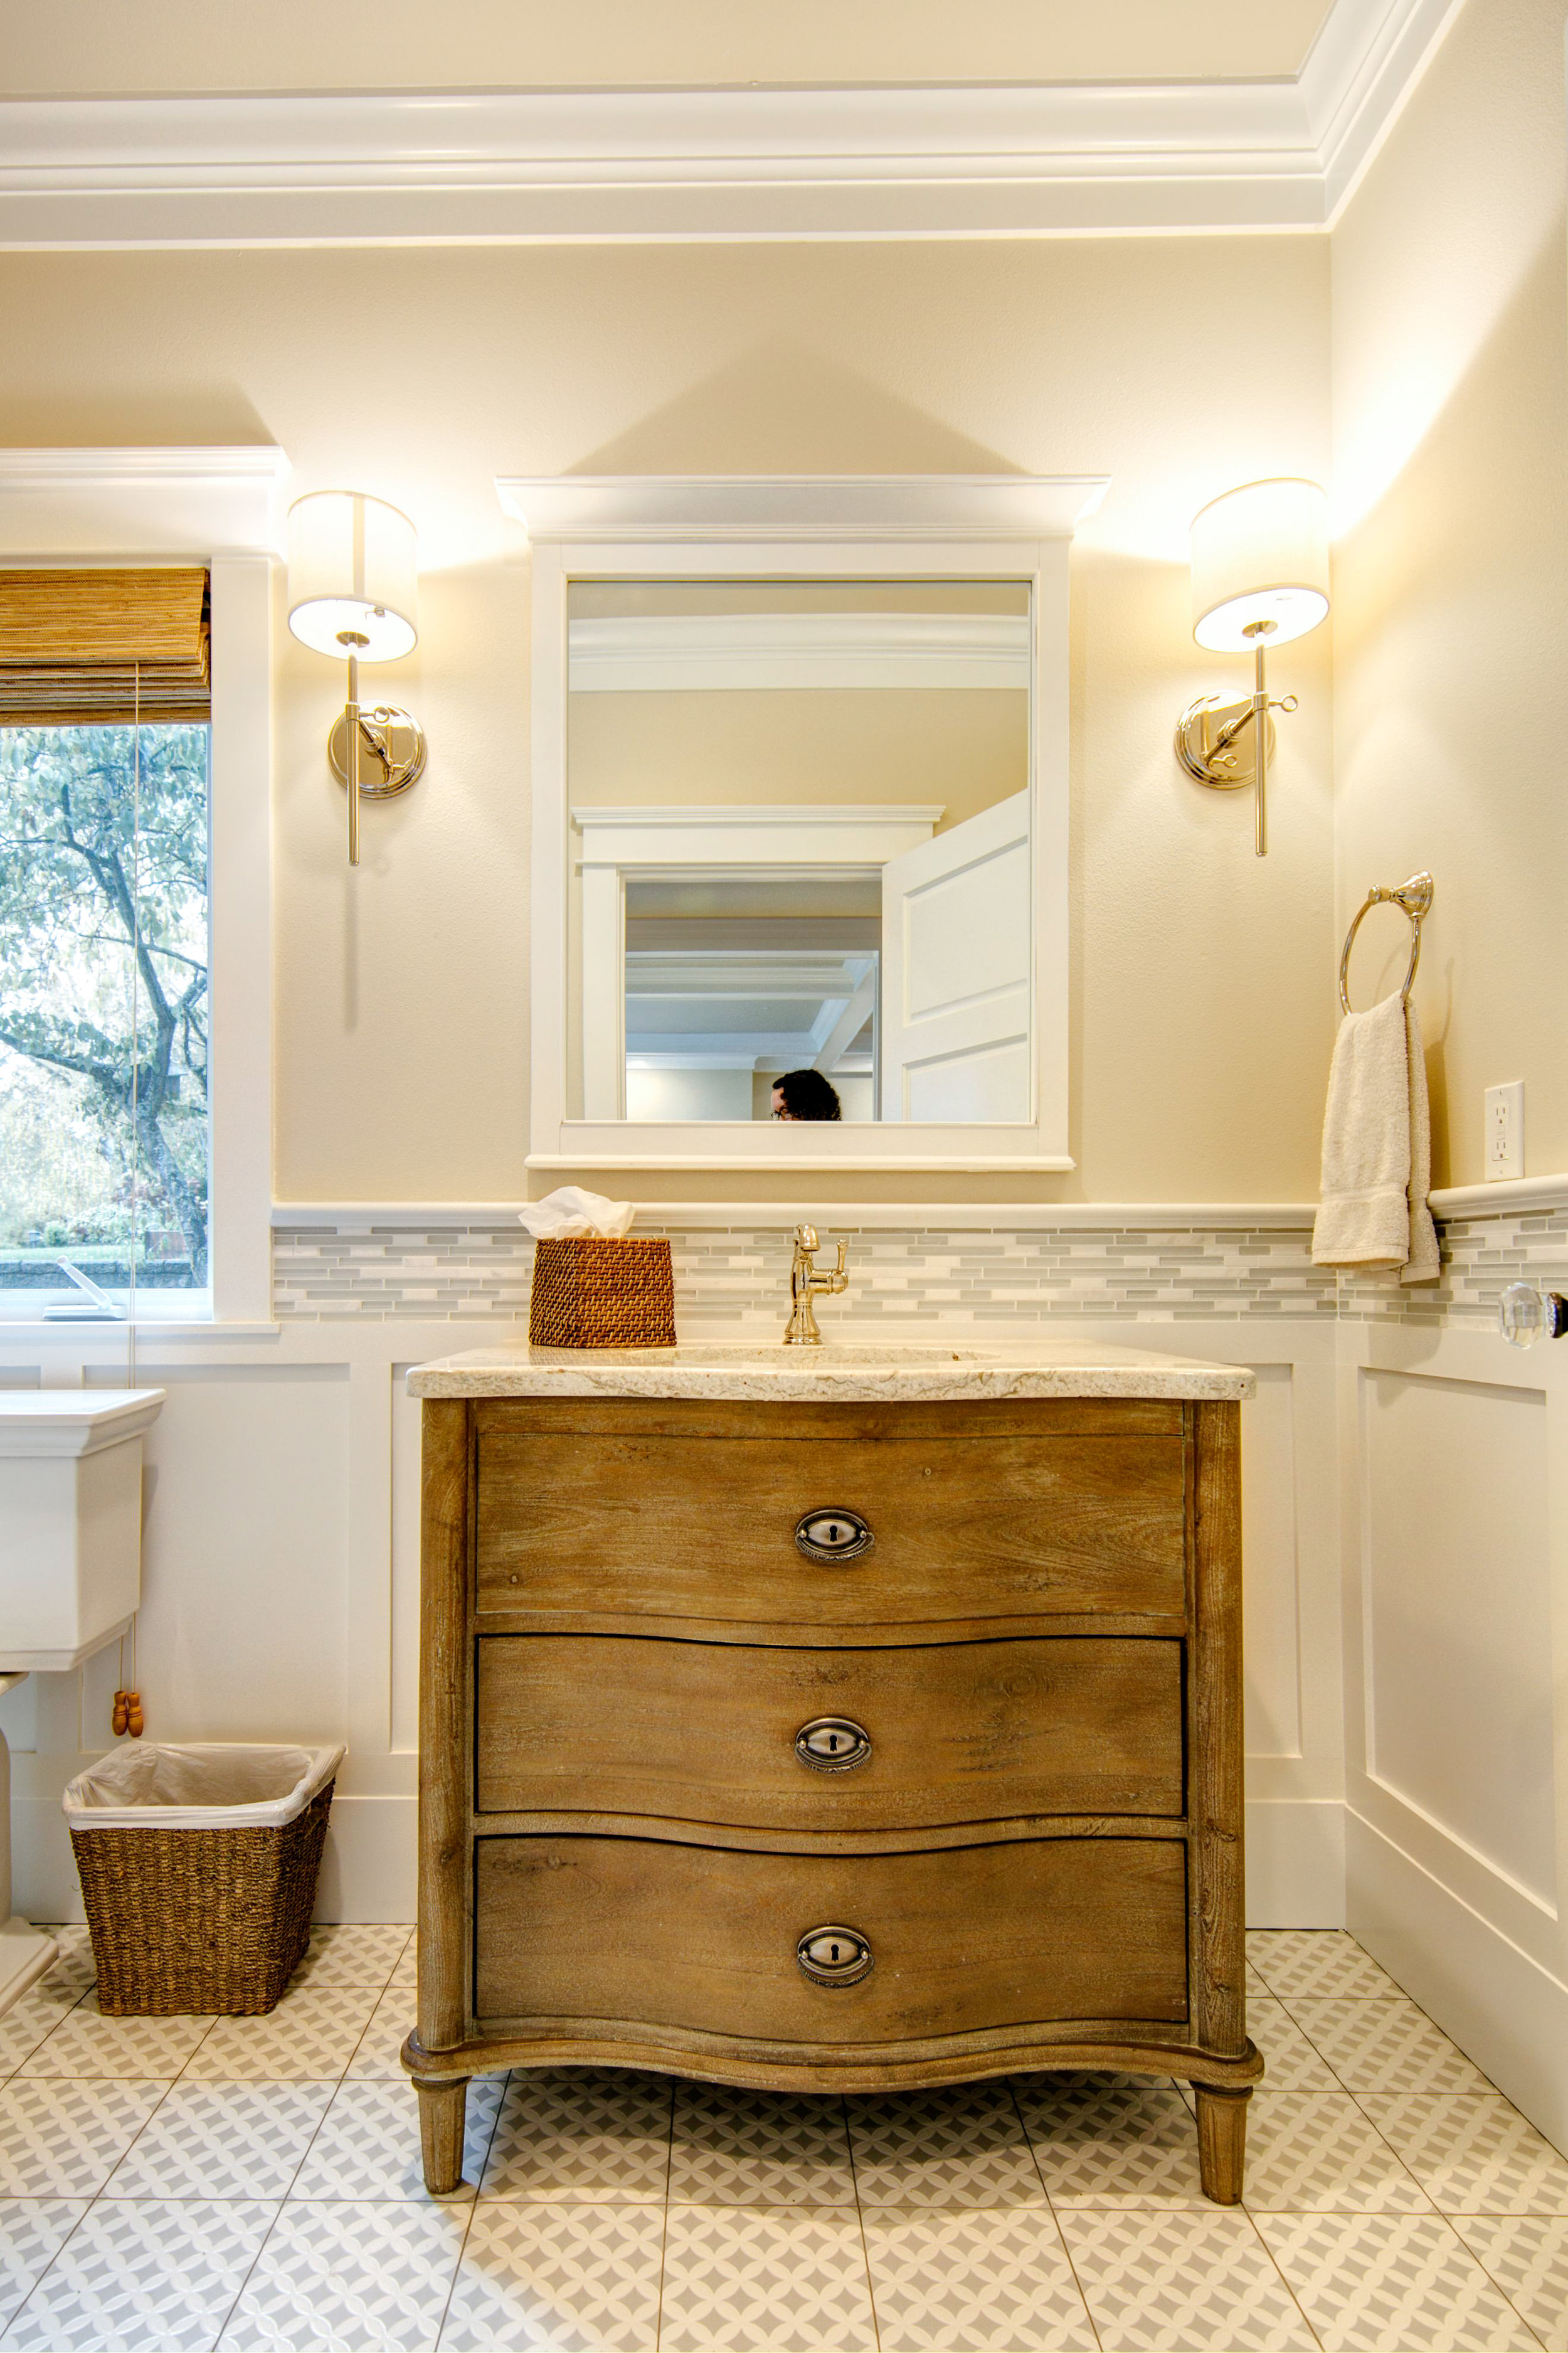 mandy callaway interiors-greenlake house-00012.jpg